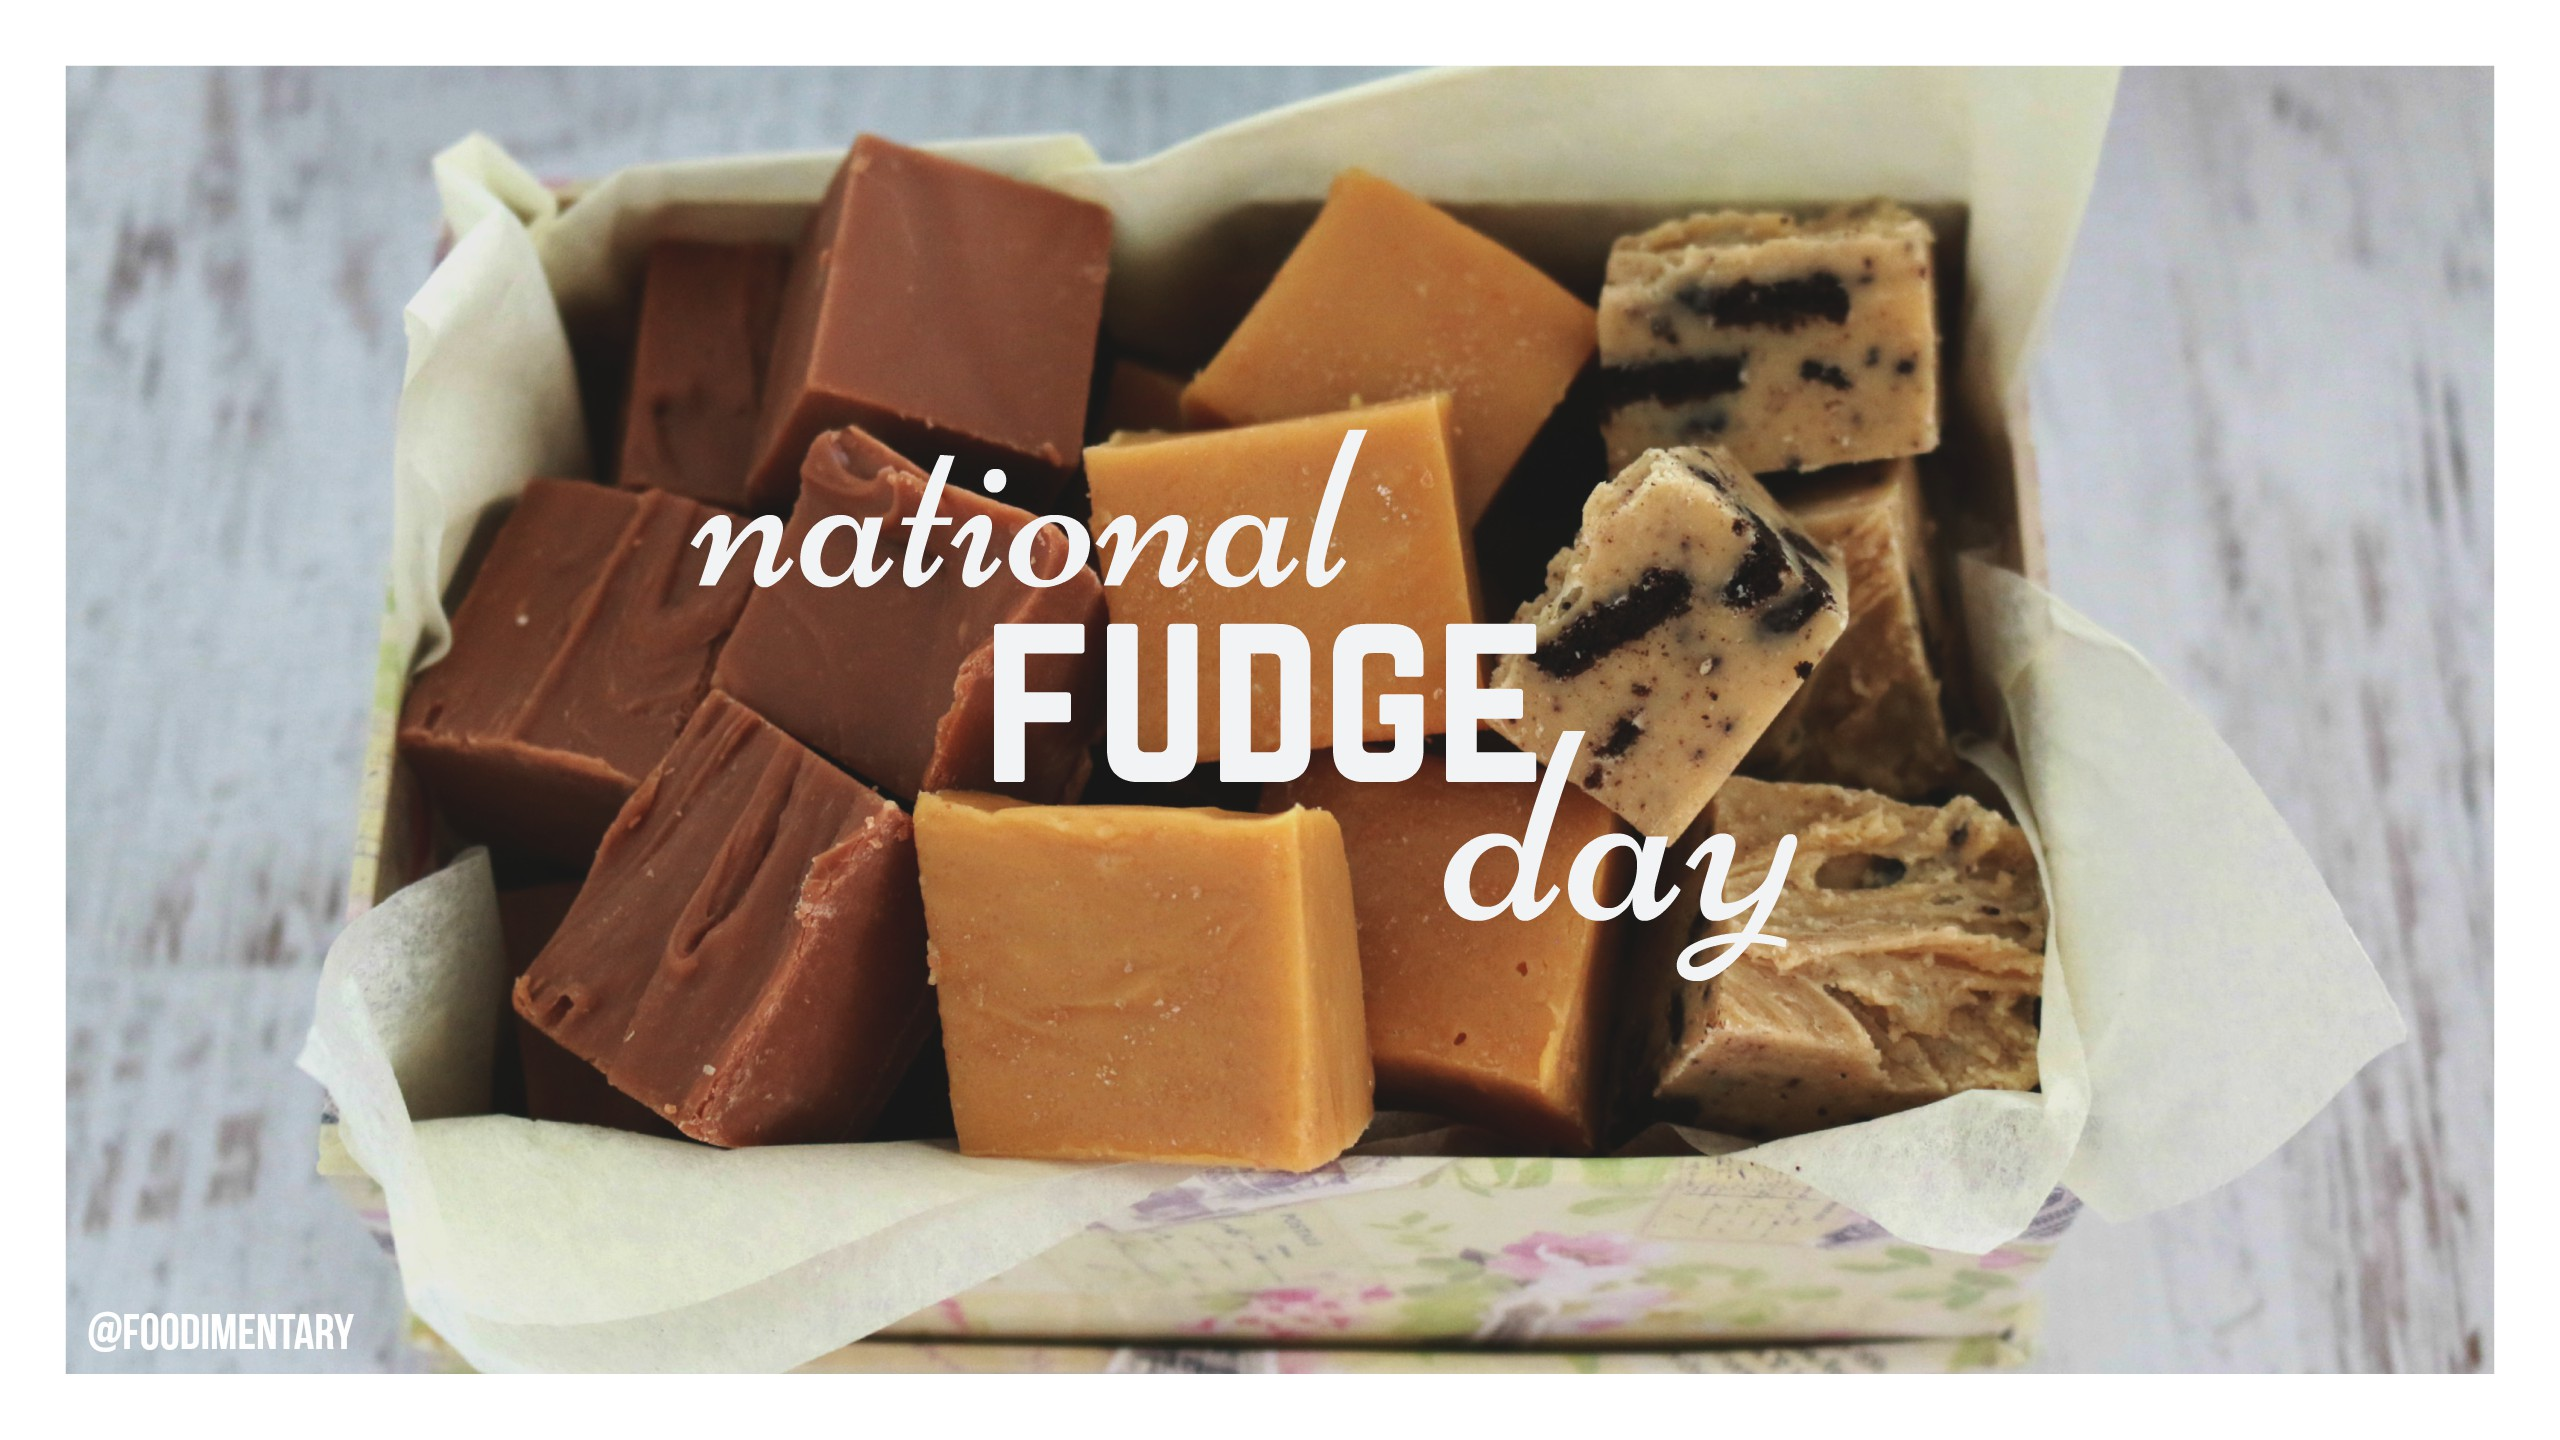 national fudge day | Foodimentary - National Food Holidays